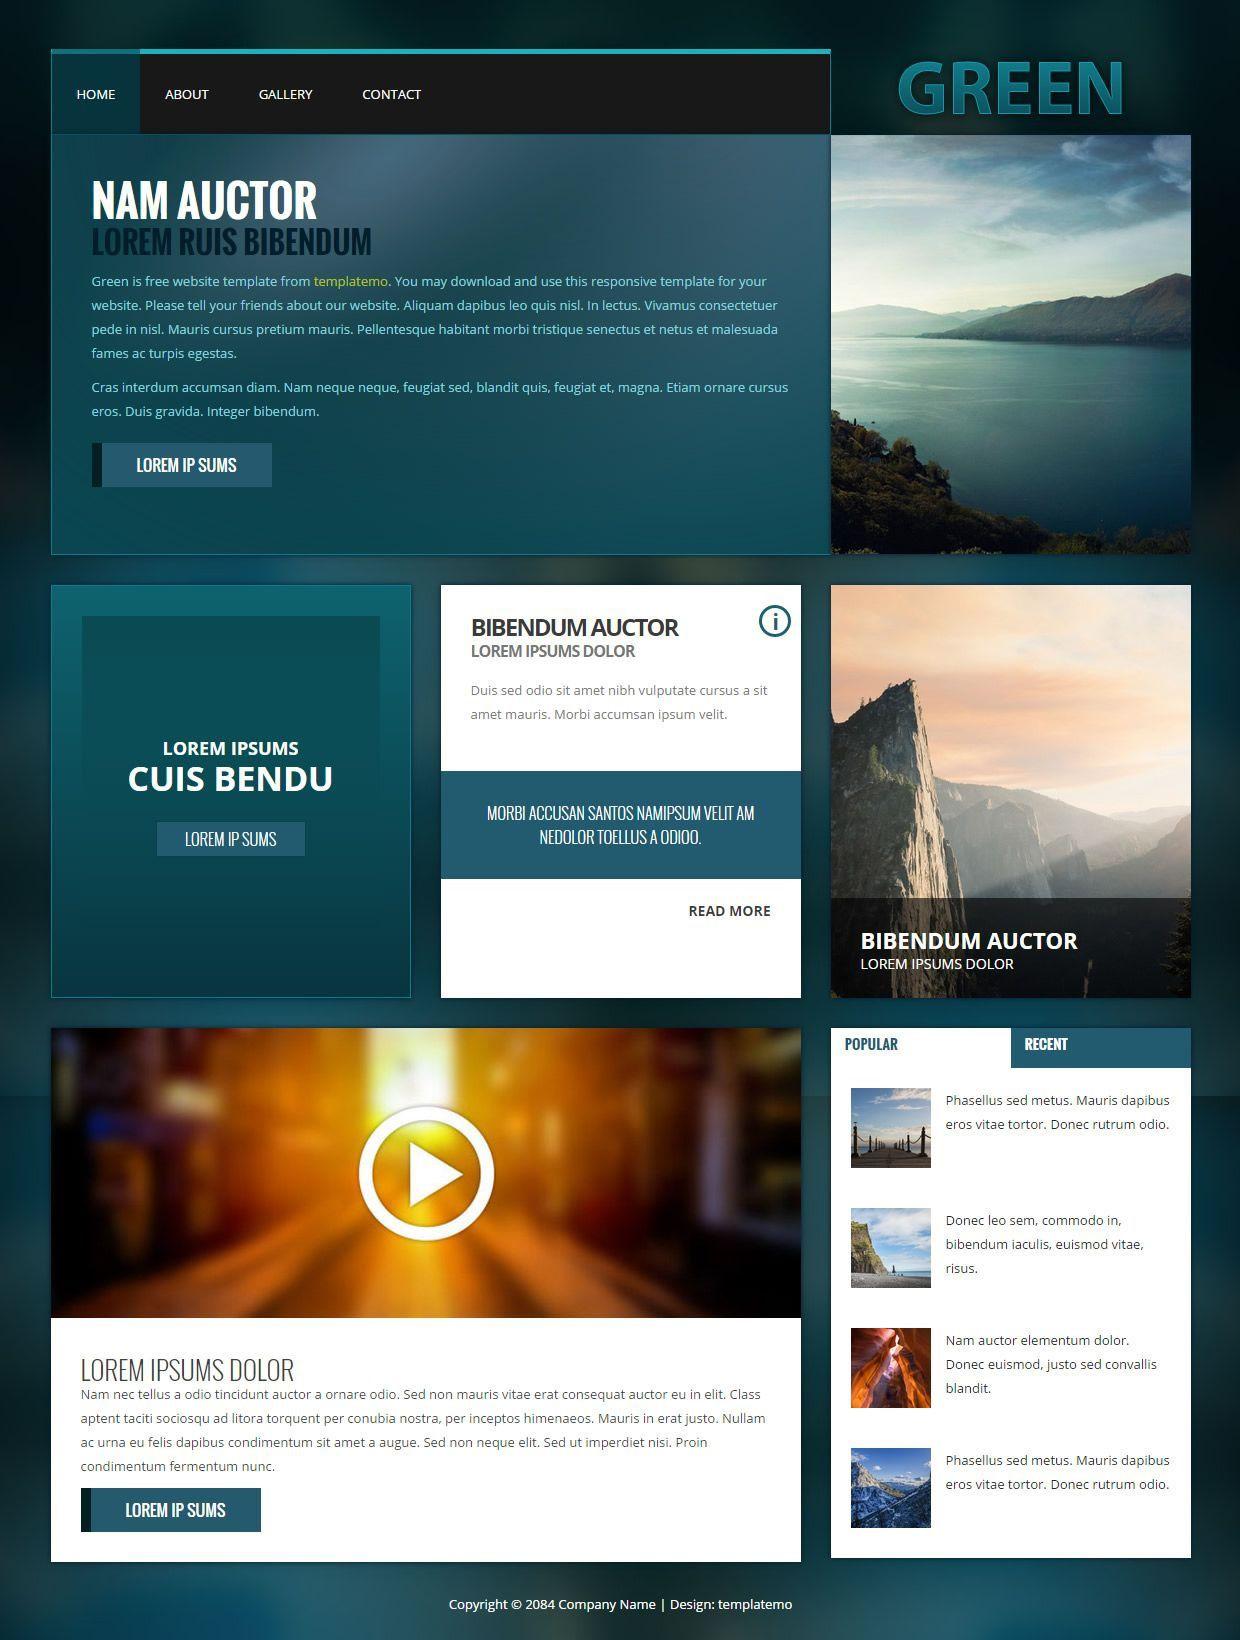 001 Striking Web Page Design Template Cs Image  CssFull